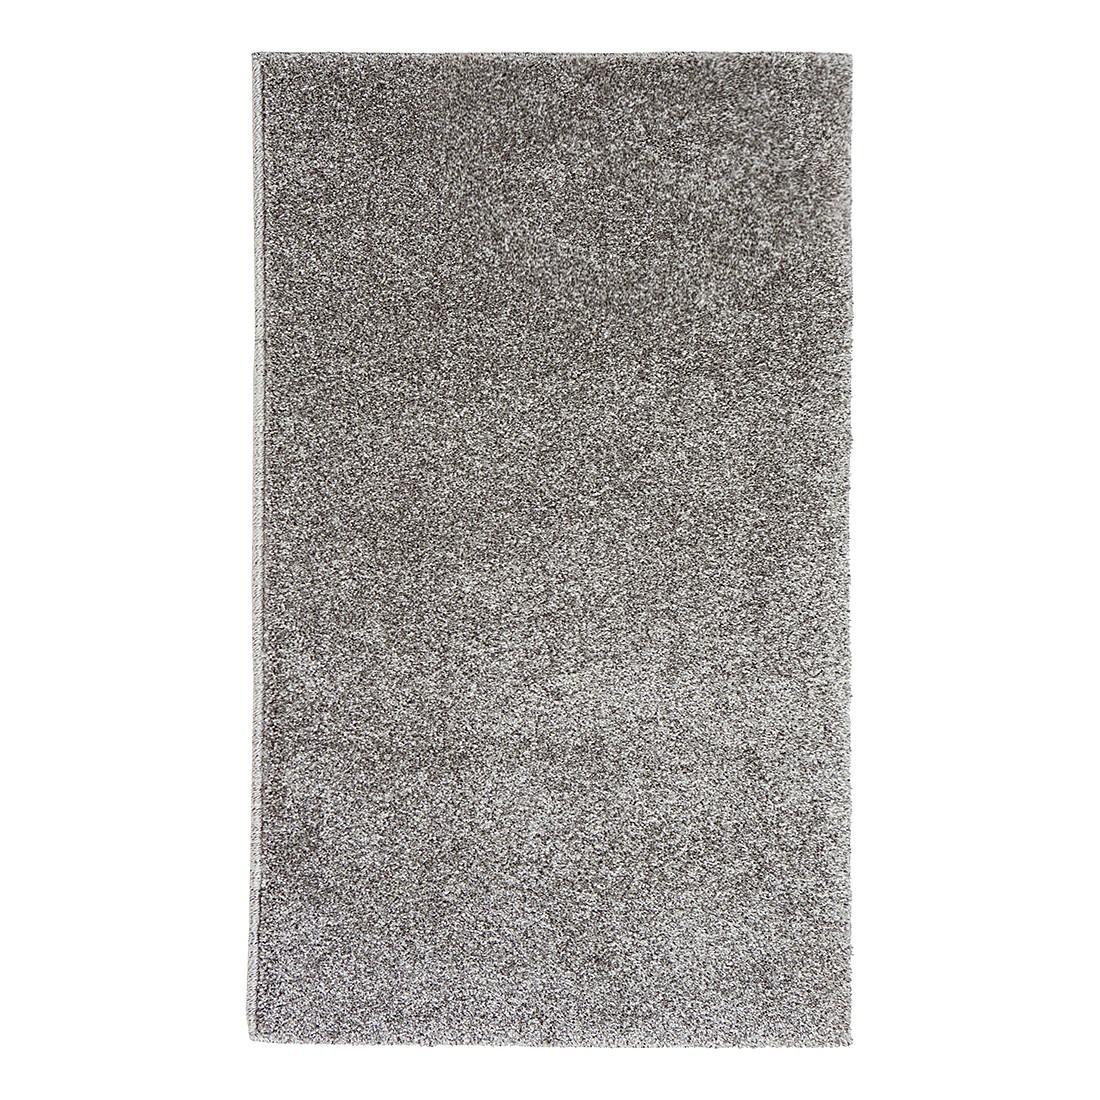 Teppich Samoa I - Grau - 200 x 290 cm, Astra